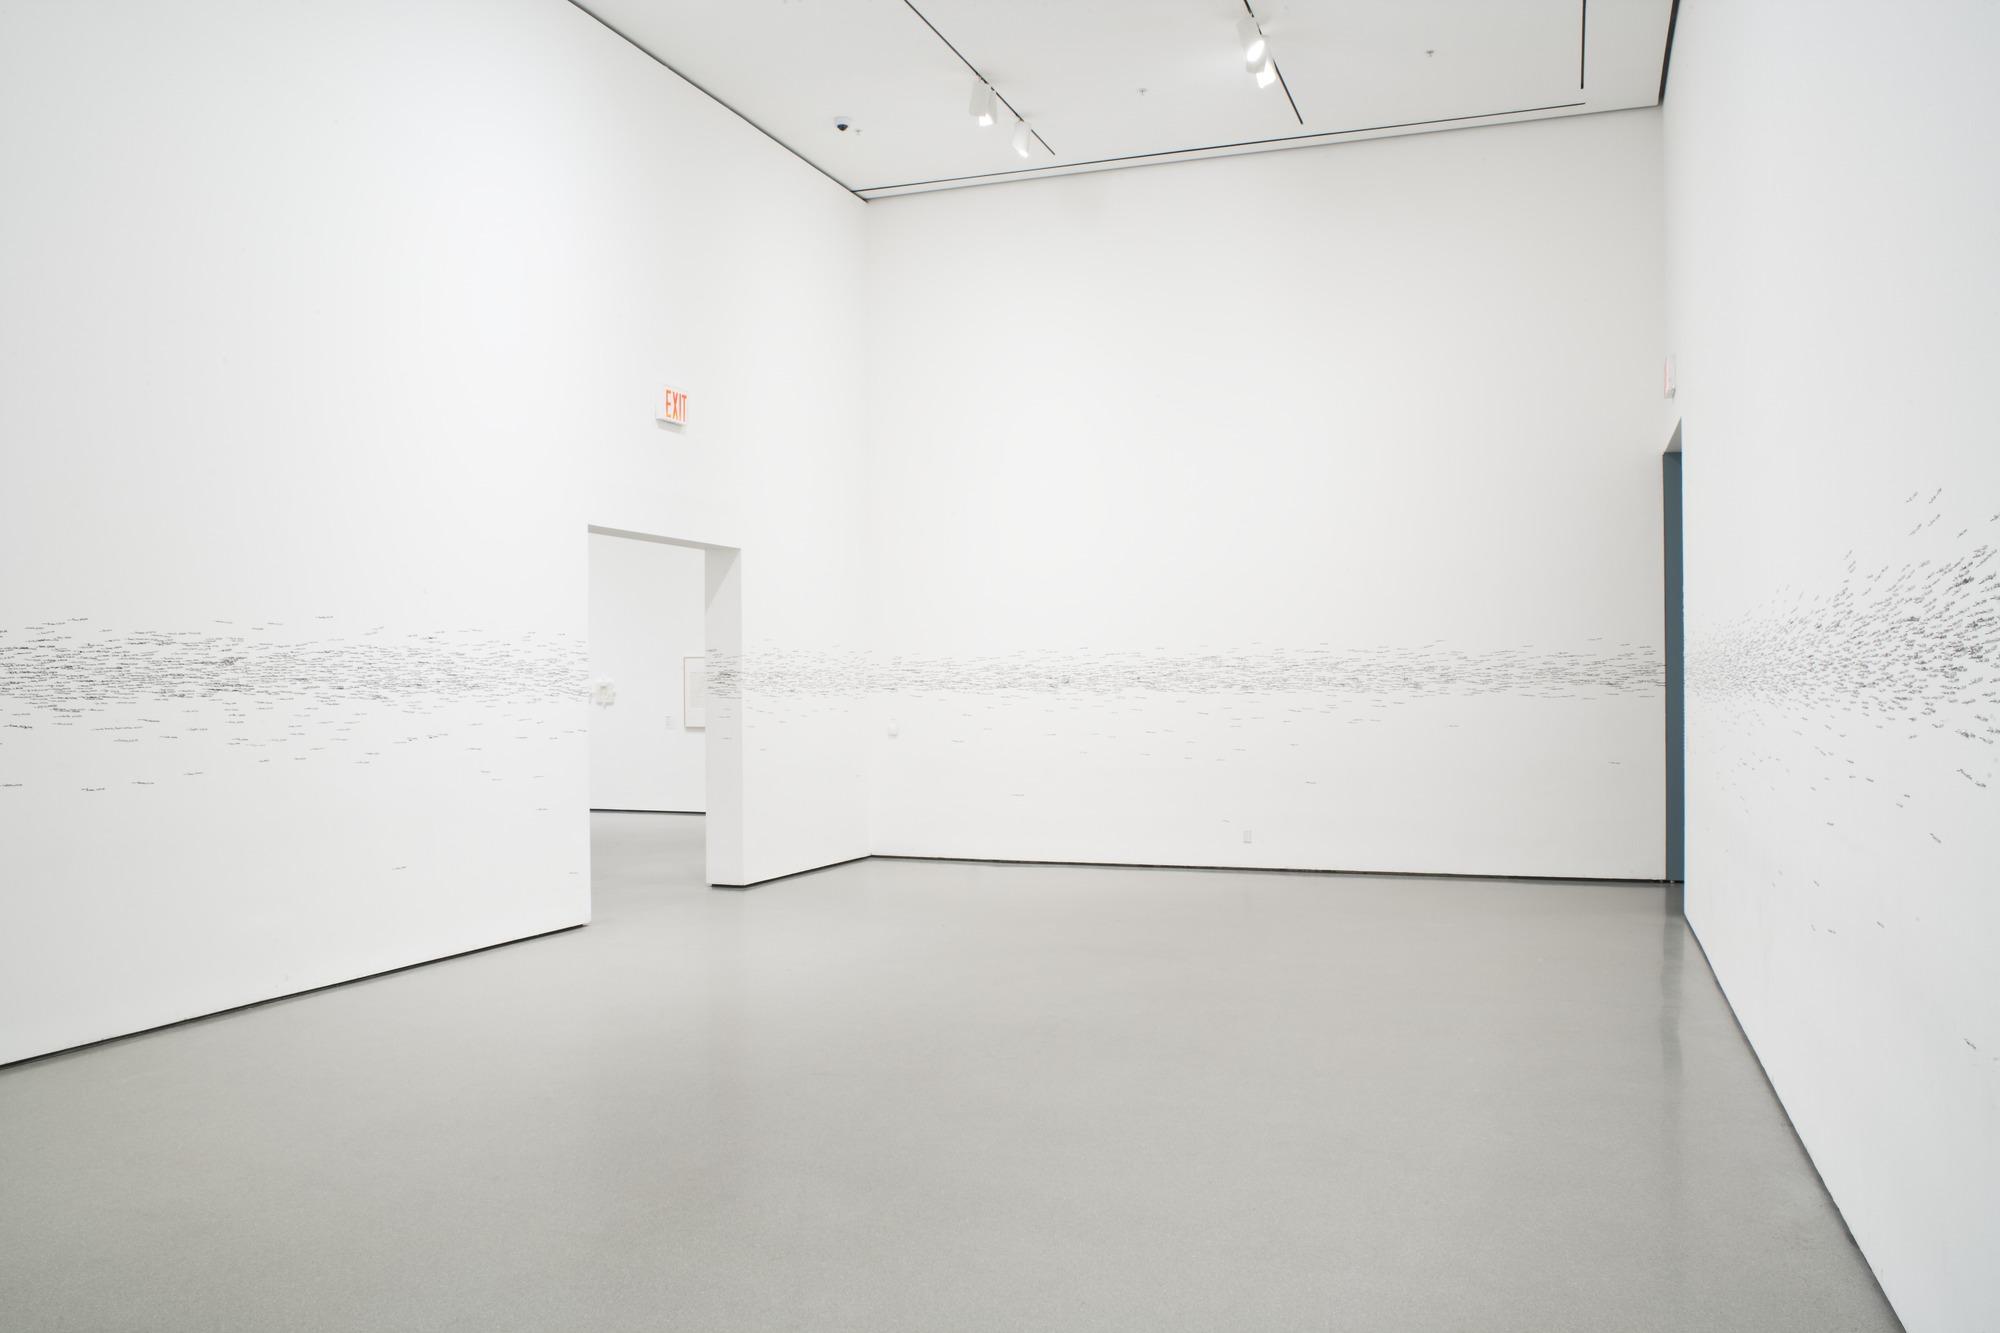 Roman Ondak, Measuring the Universe - prima, MoMA, New York (2007)